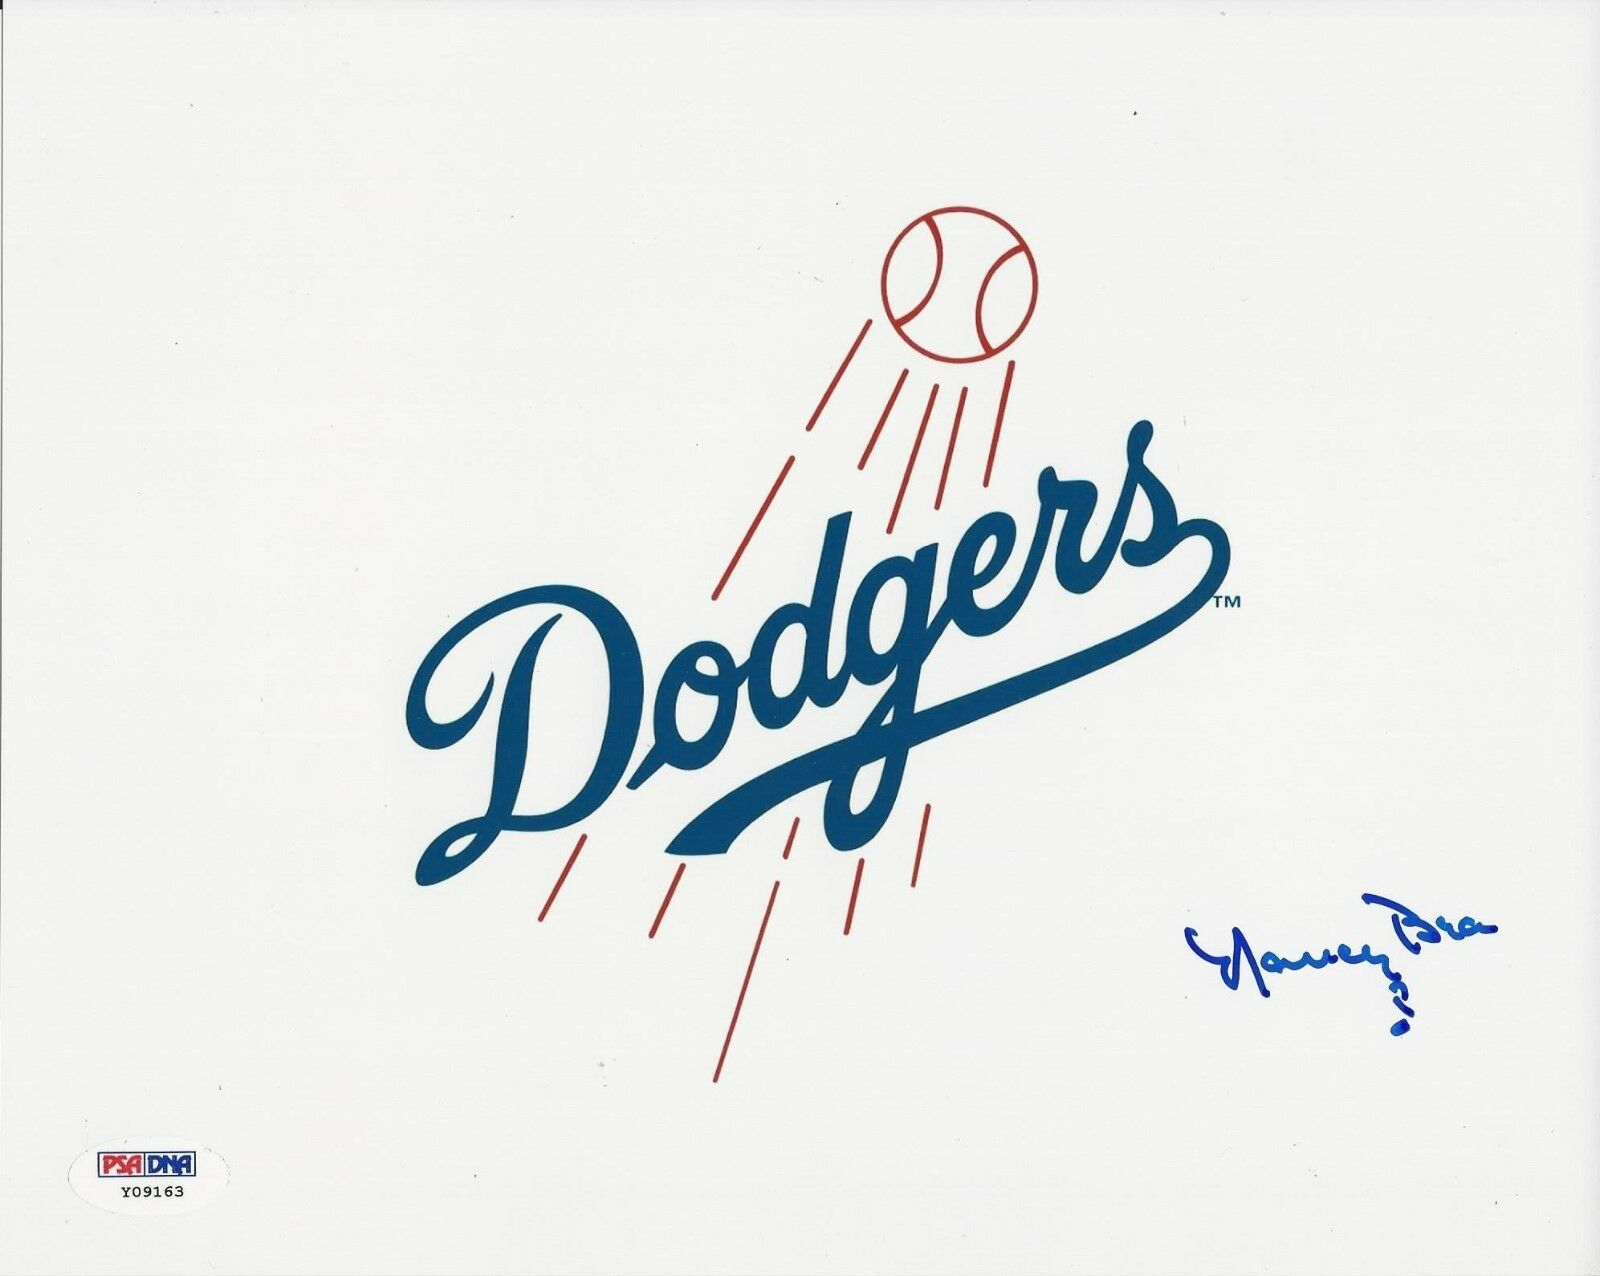 Nancy Bea Hefley Dodgers Signed 8x10 Photo PSA/DNA # Y09163